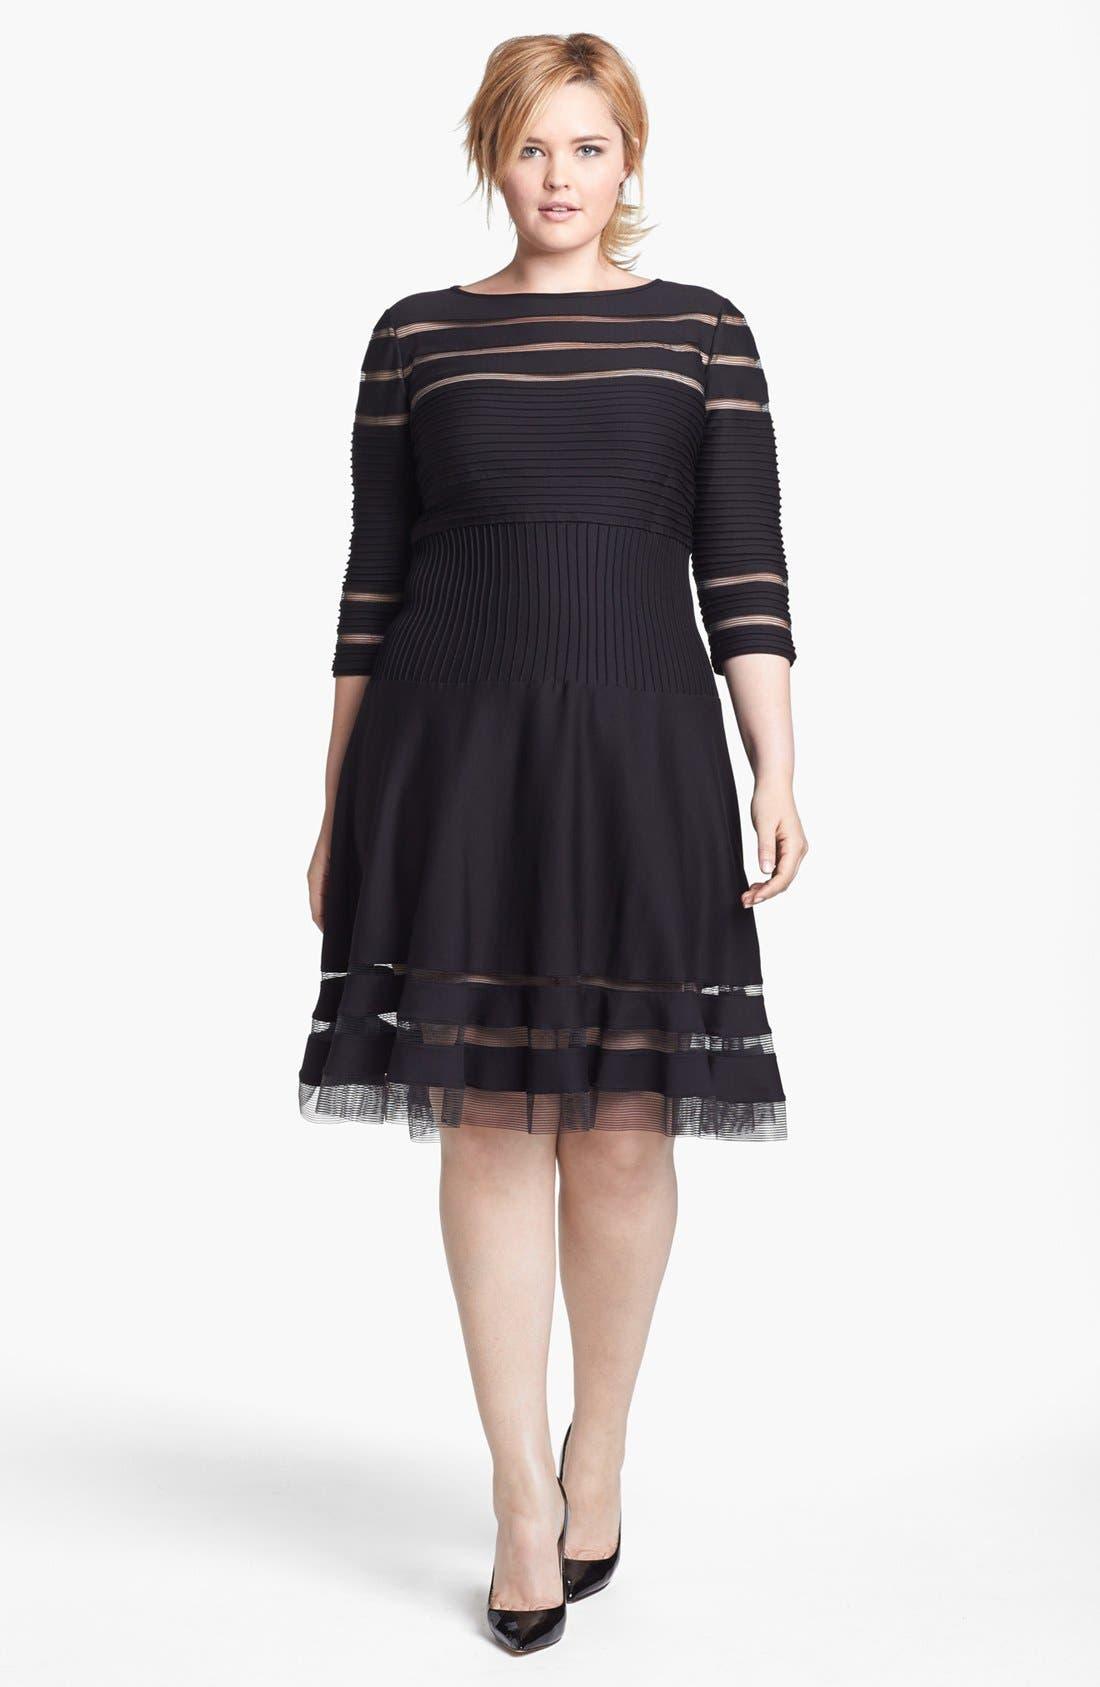 Alternate Image 1 Selected - Tadashi Shoji Mesh Stripe Fit & Flare Dress (Plus Size)